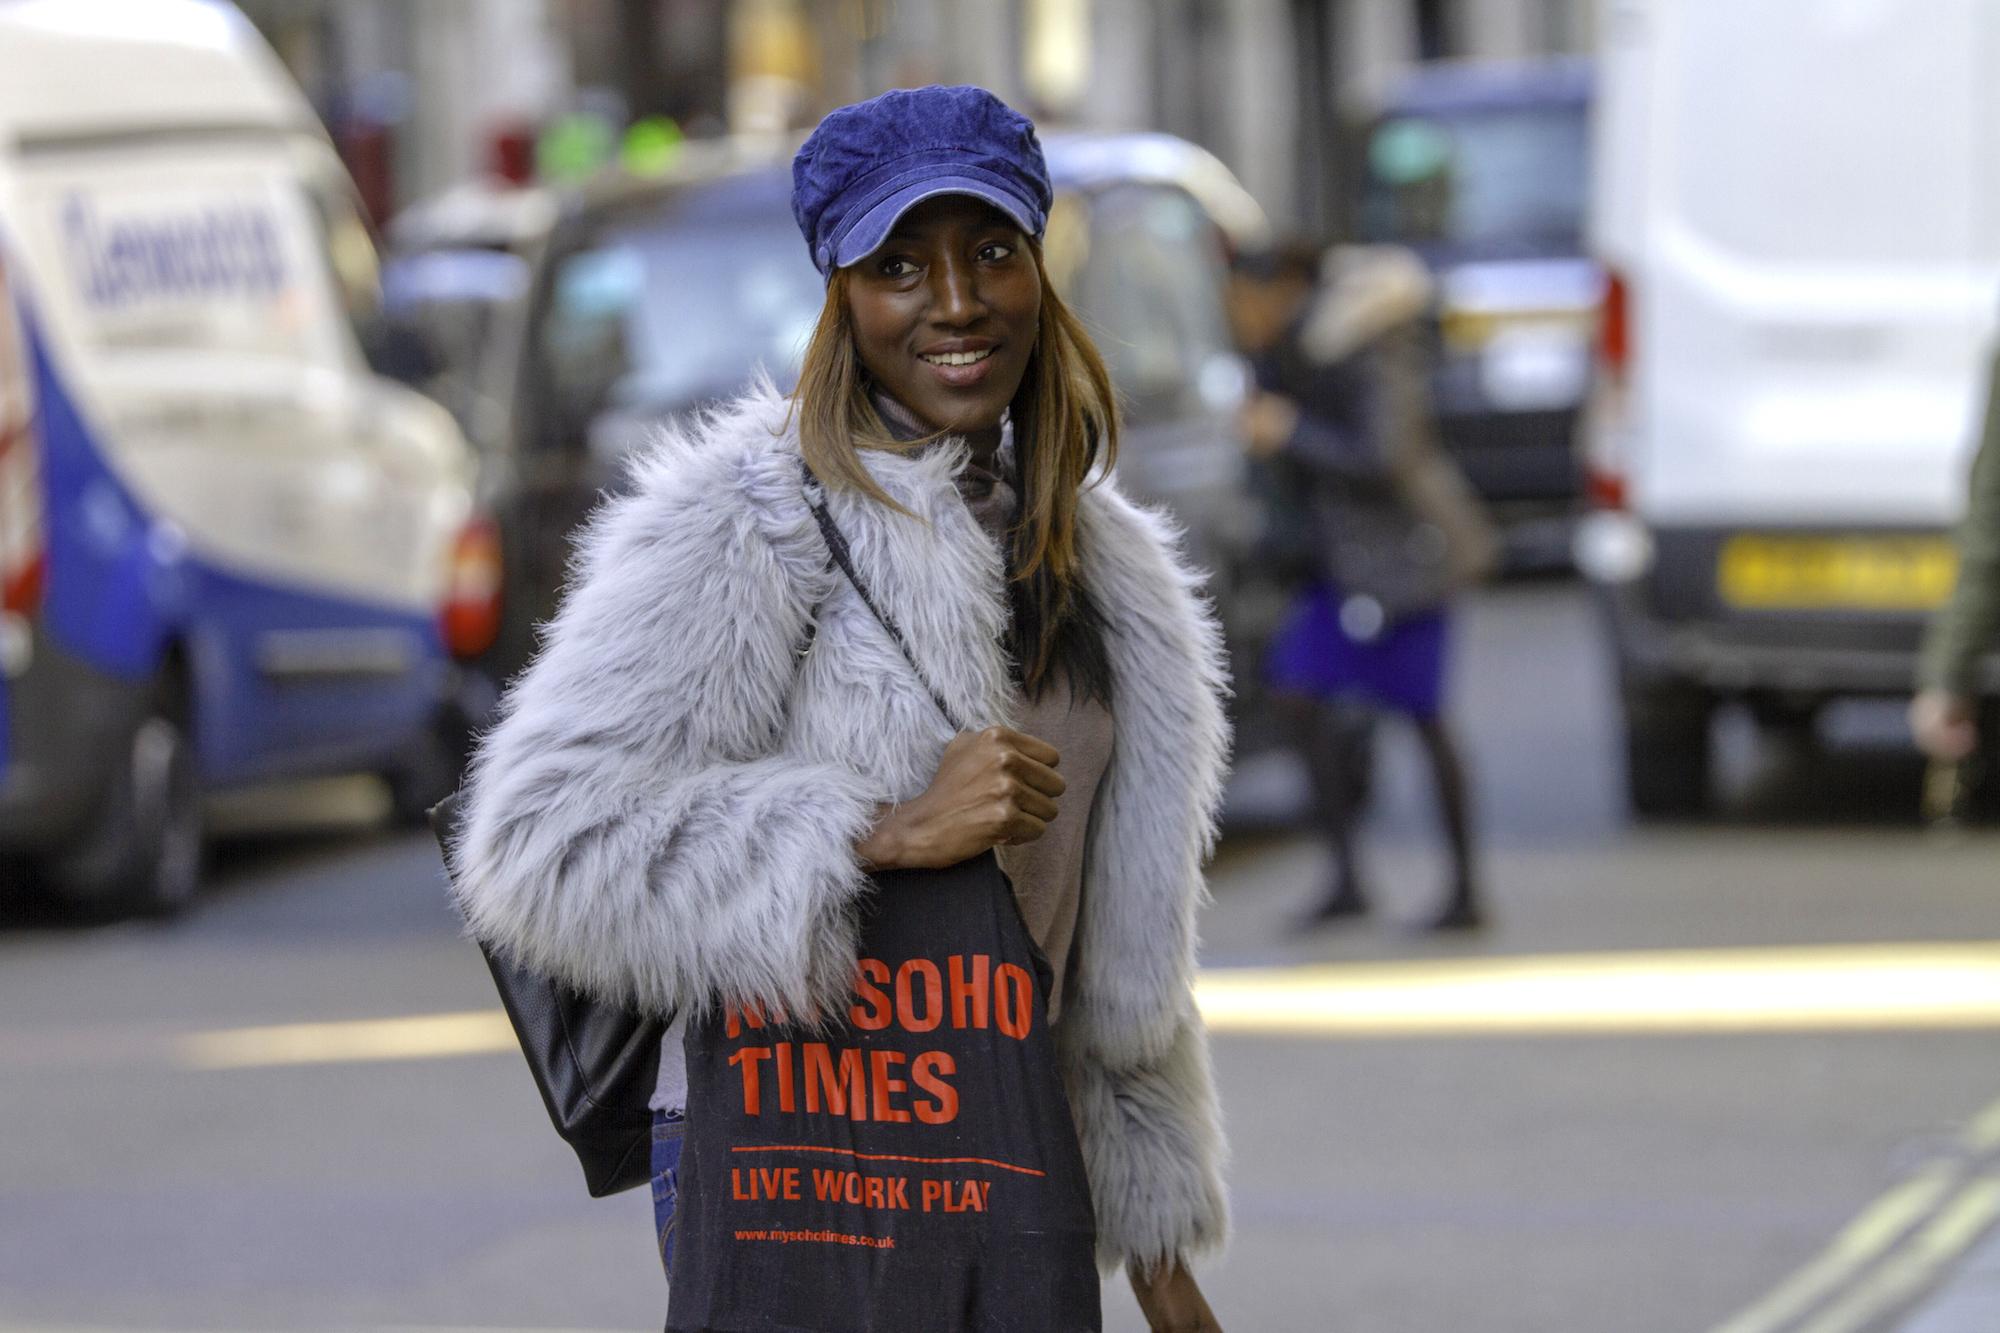 The Soho Girl | Black My Soho Times tote bag